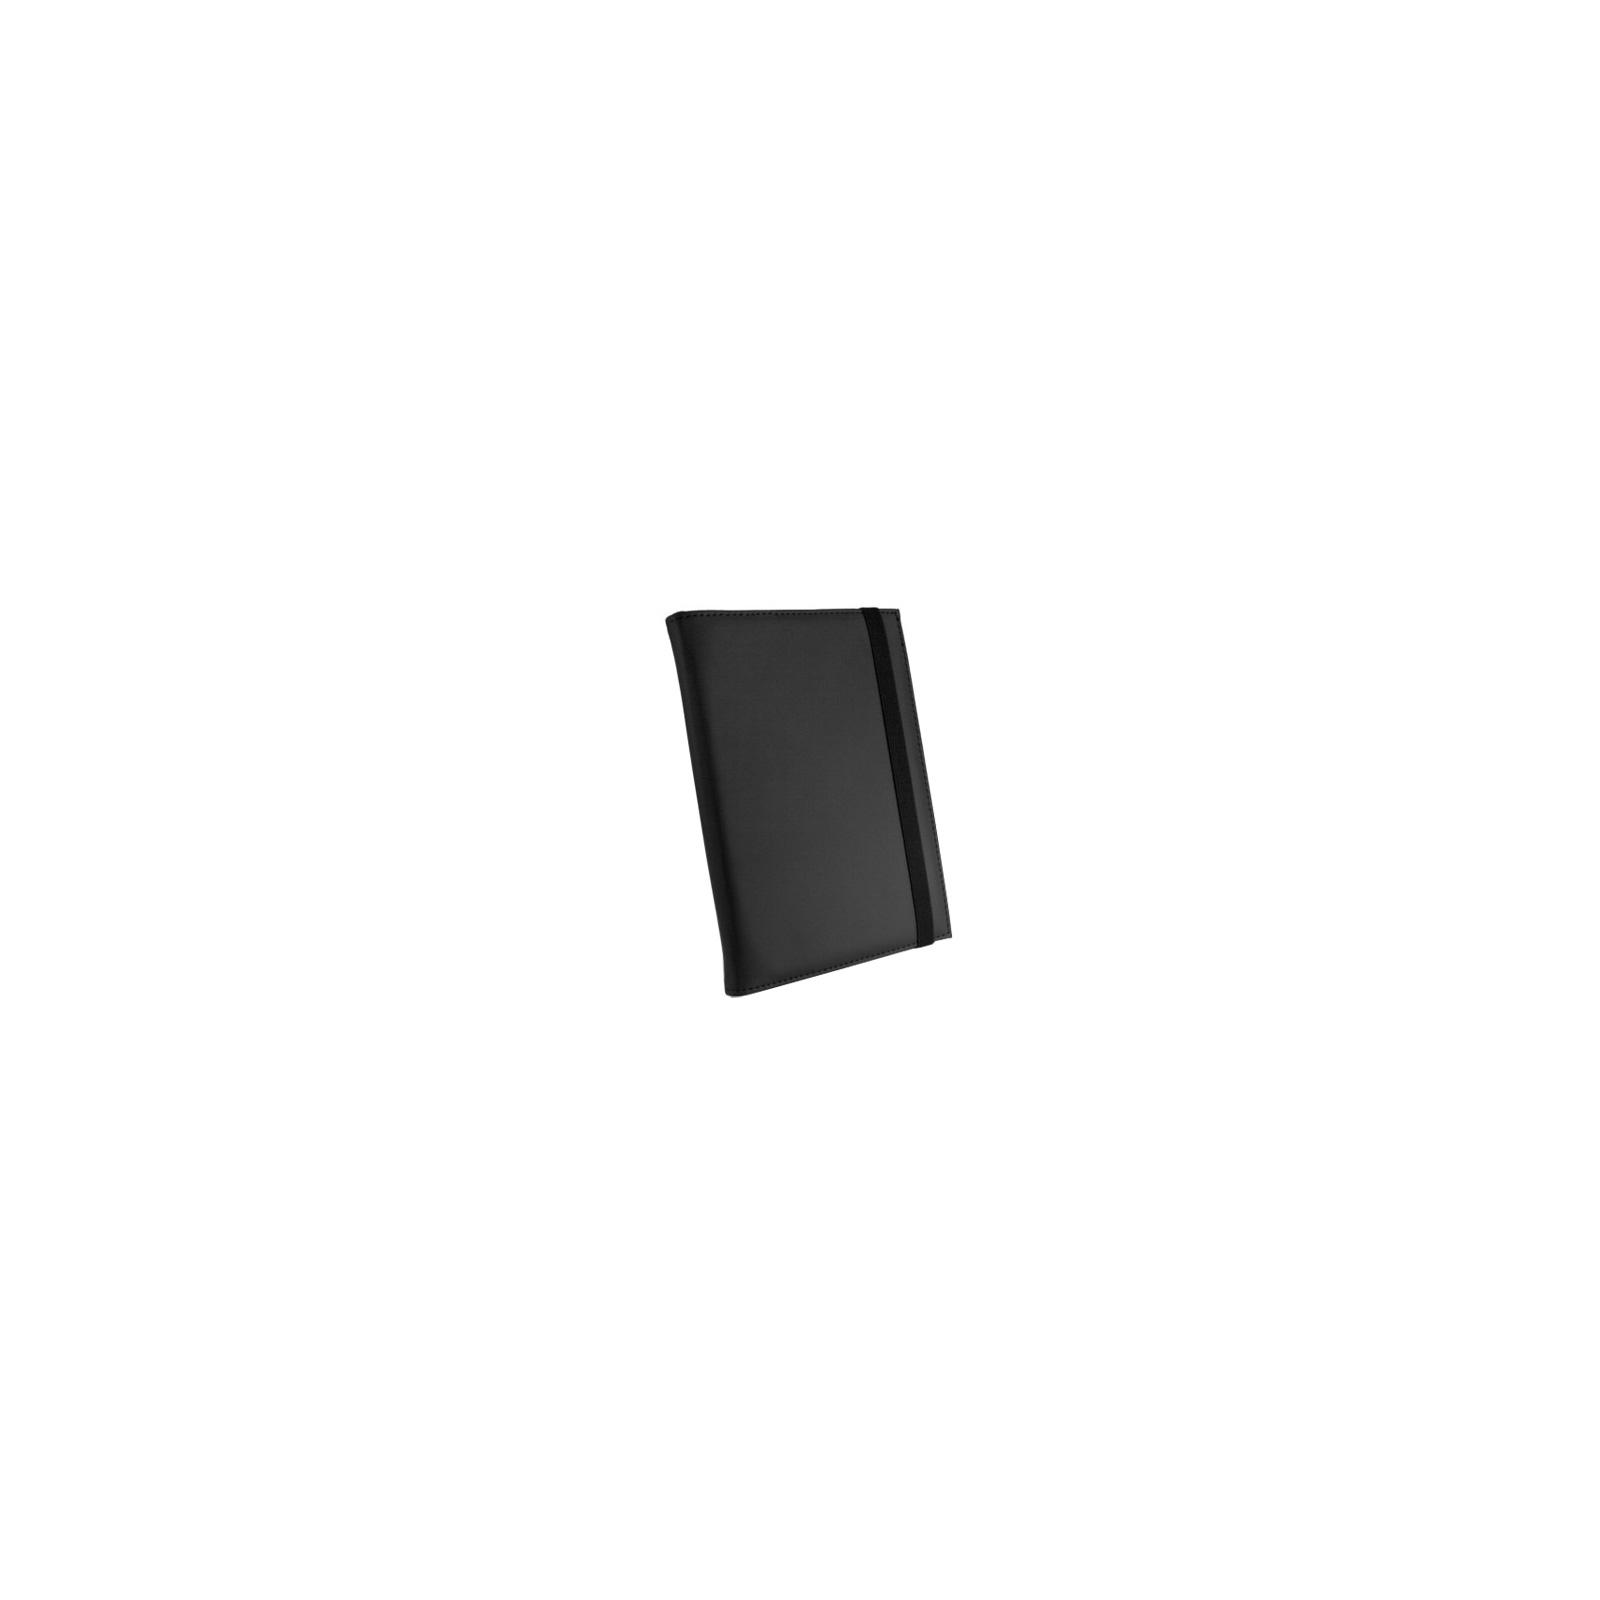 Чехол для электронной книги Tuff-Luv 6 Slim Book Black (A7_21)